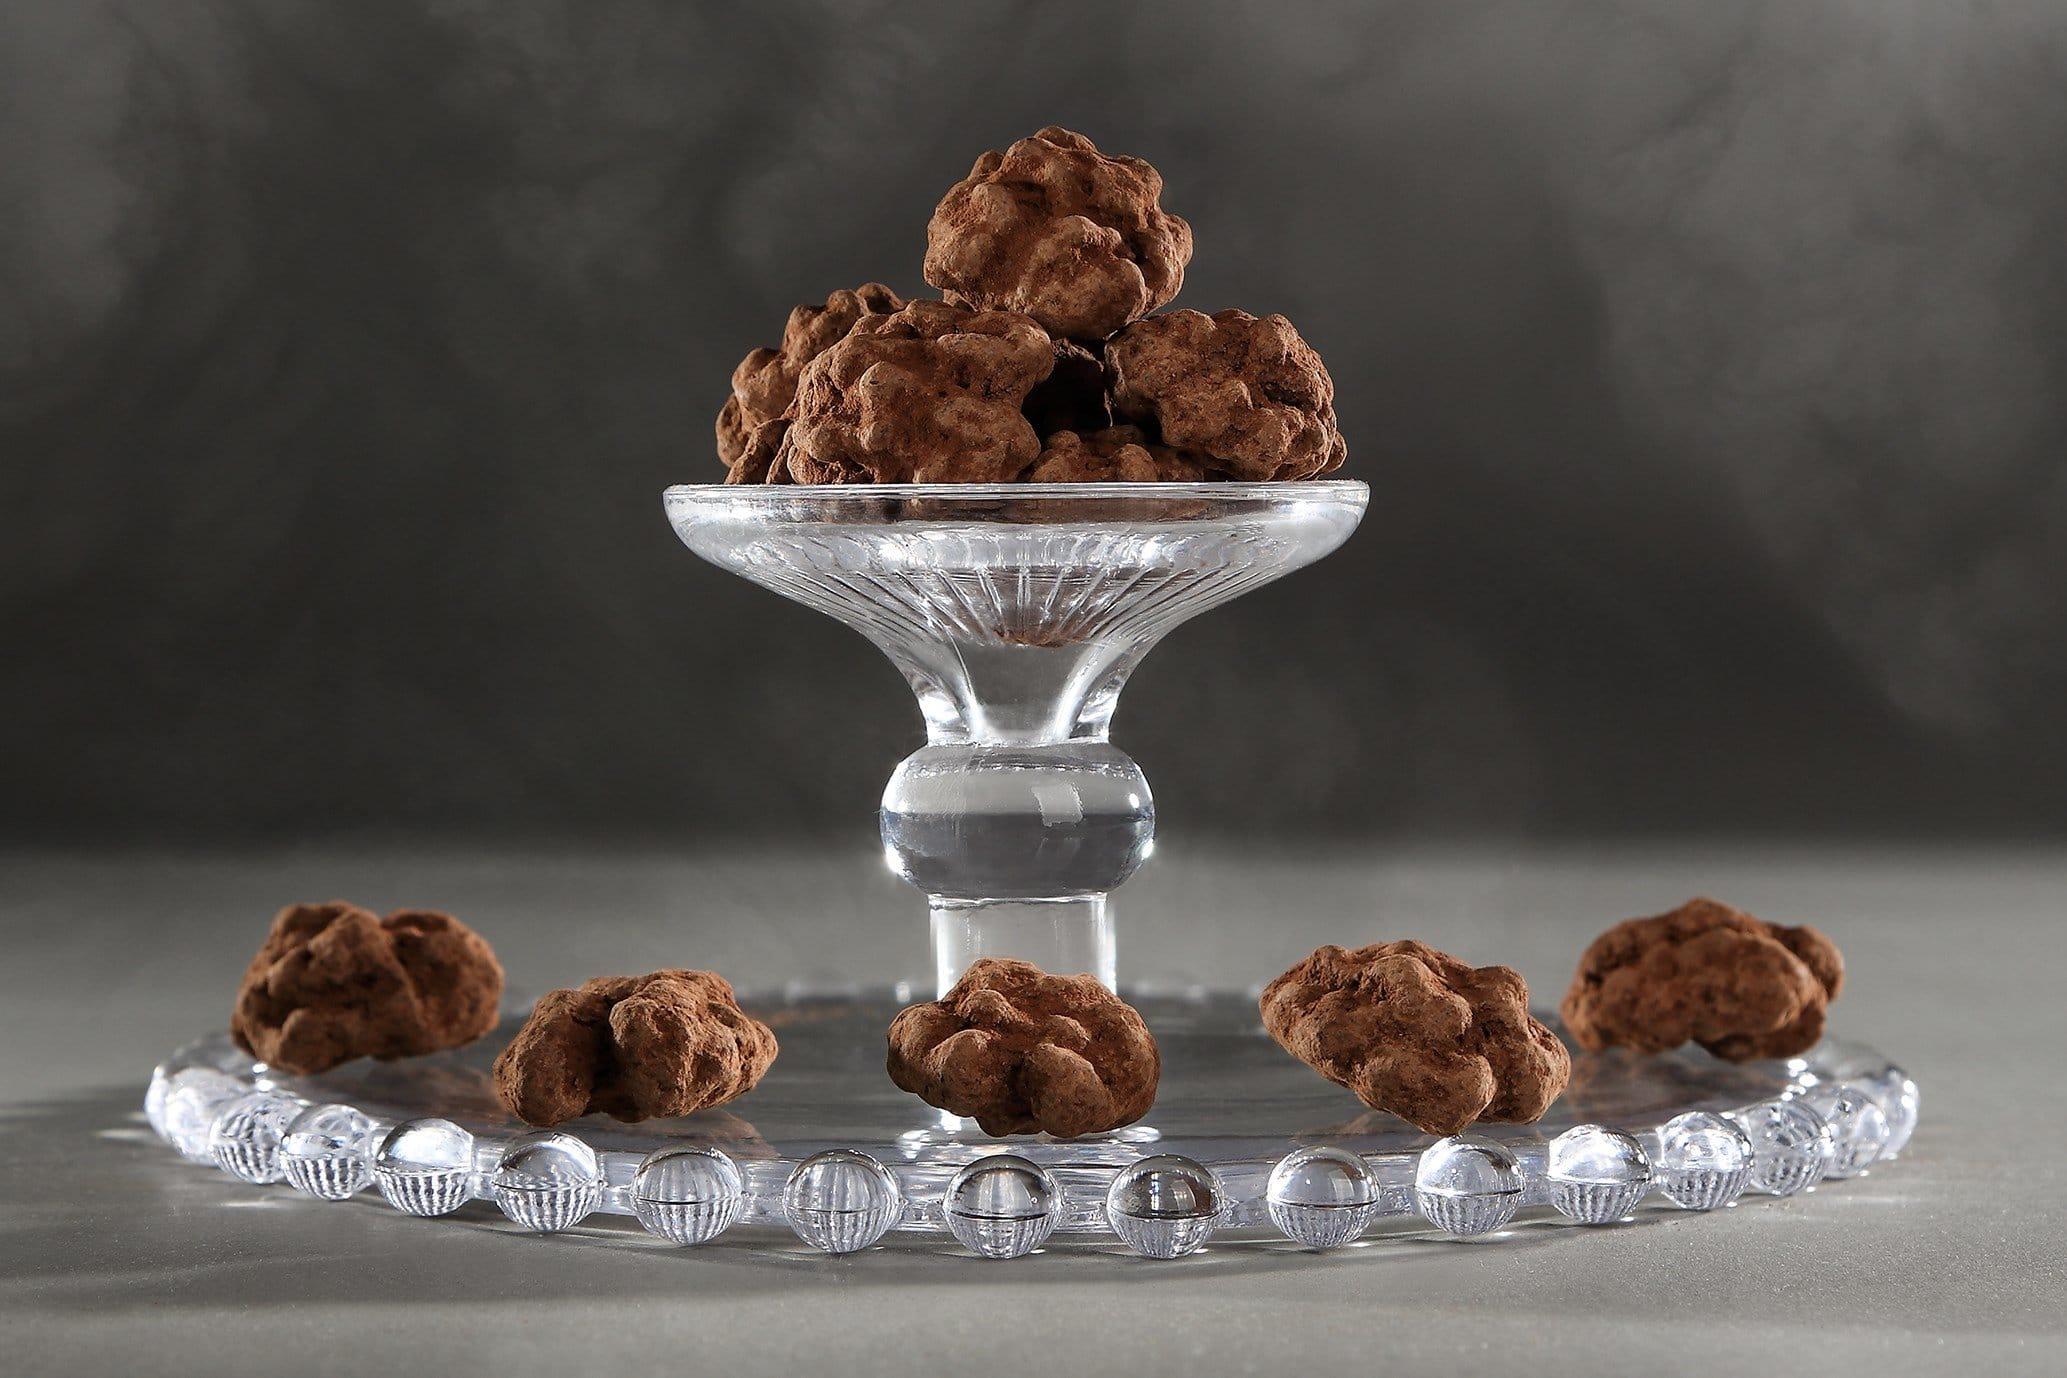 noix-au-chocolat-cacao-perigord-france